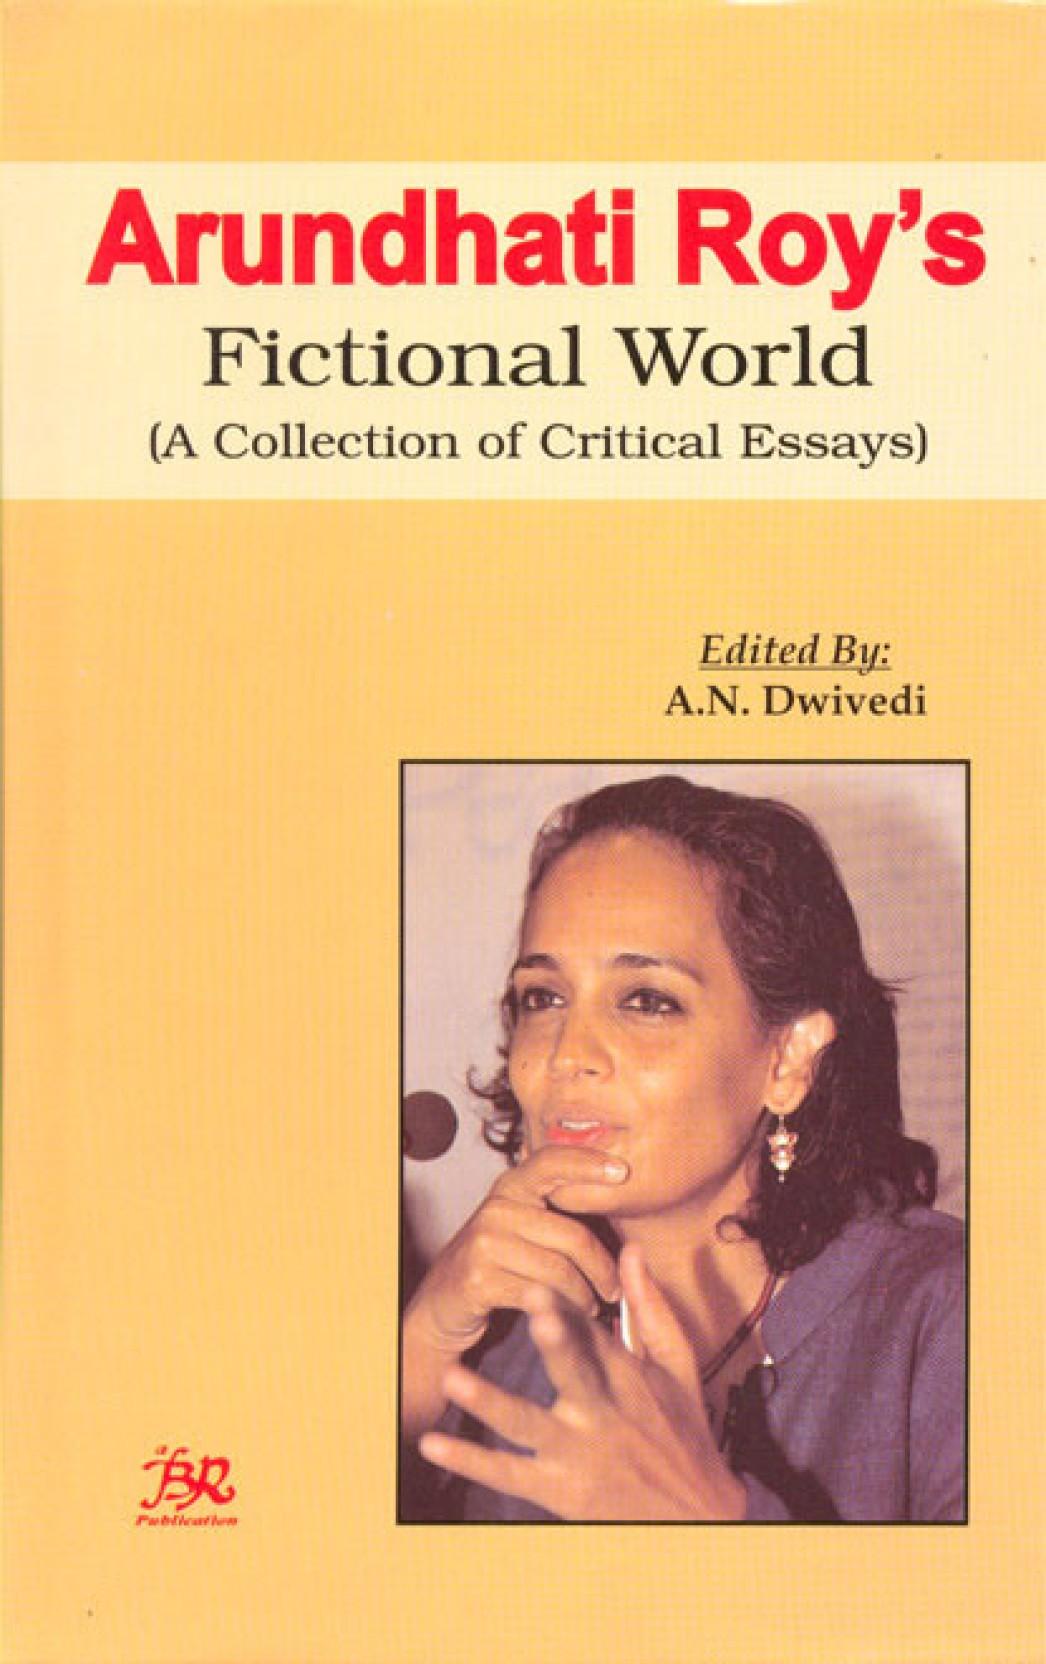 018 Essays By Arundhati Roy Essay Example Arundhuti Roys Fictional World Original Sensational Full